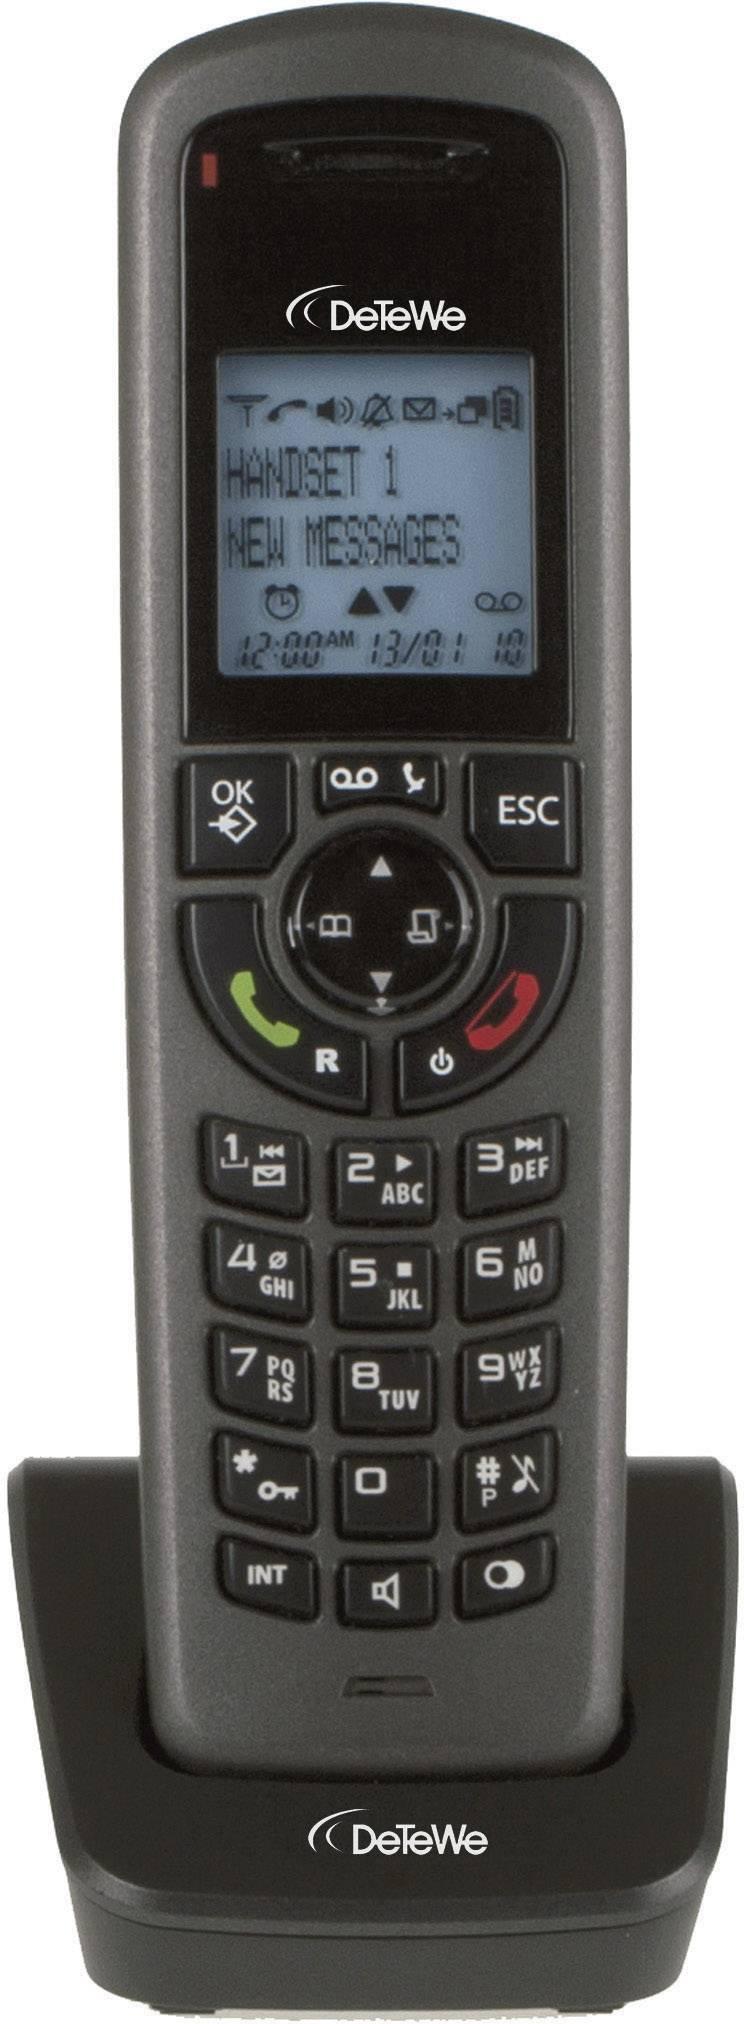 Téléphone DeTeWe BeeTel 900c